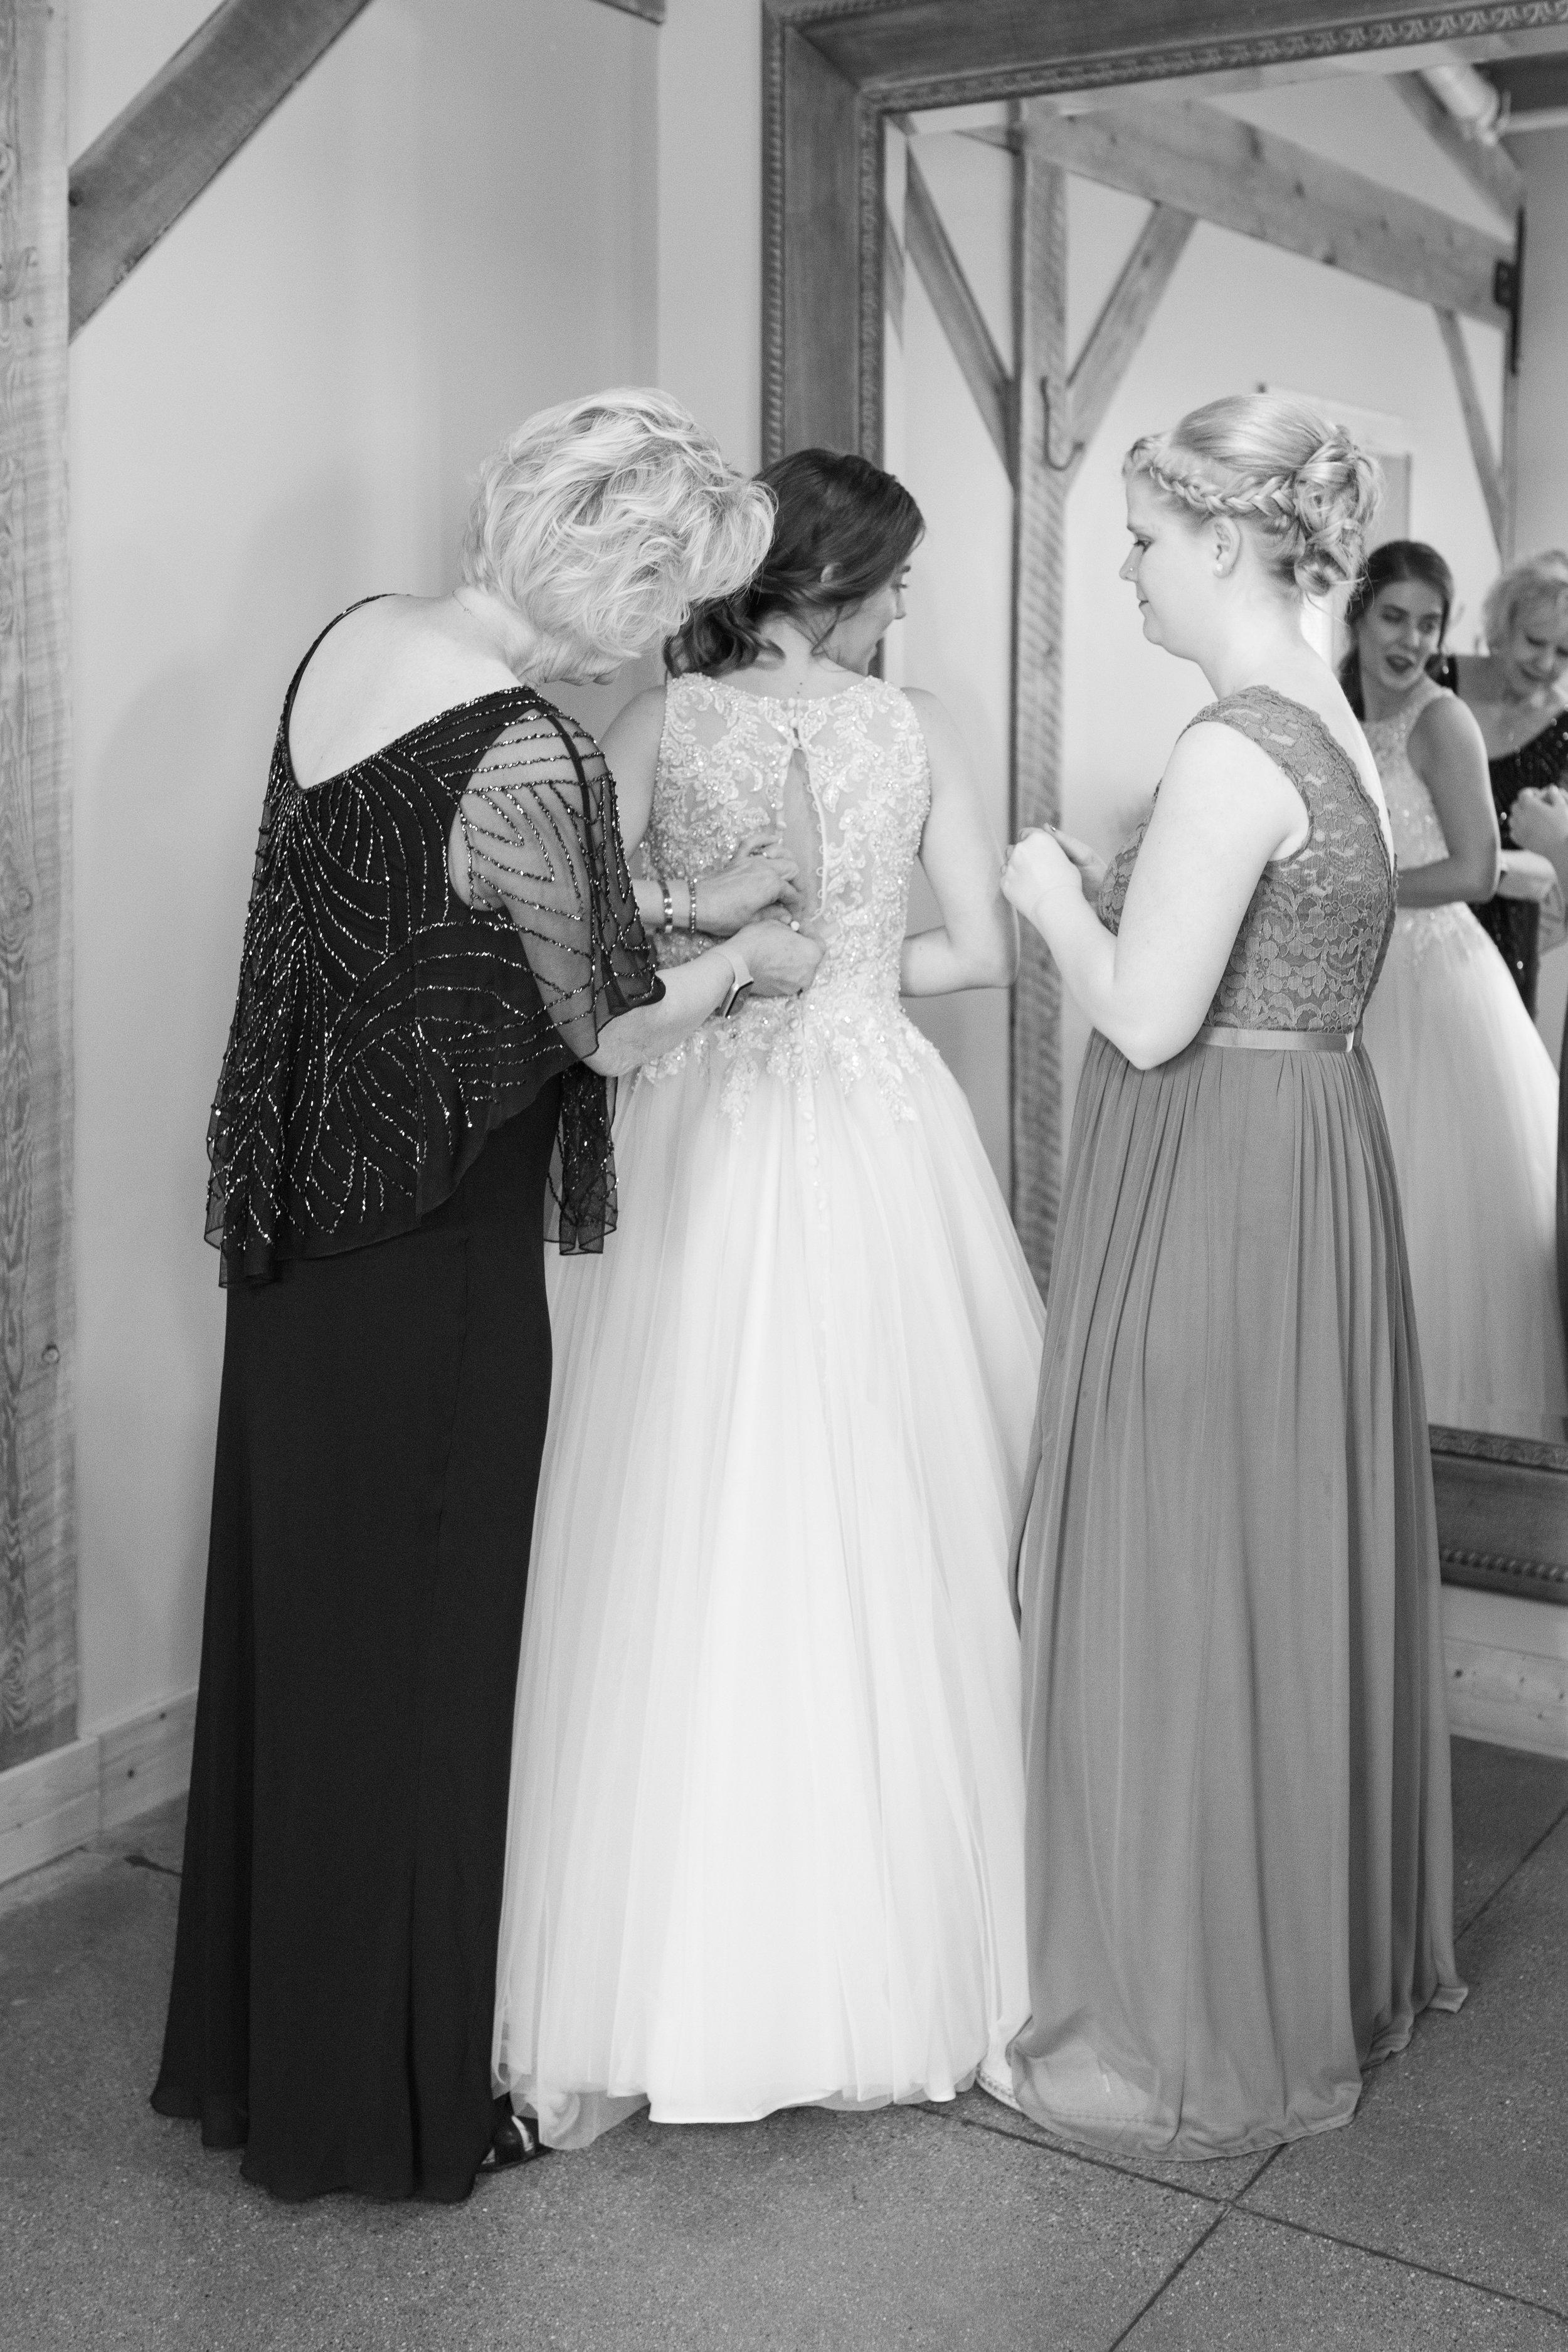 BrideGettingIntoHerWeddingDress